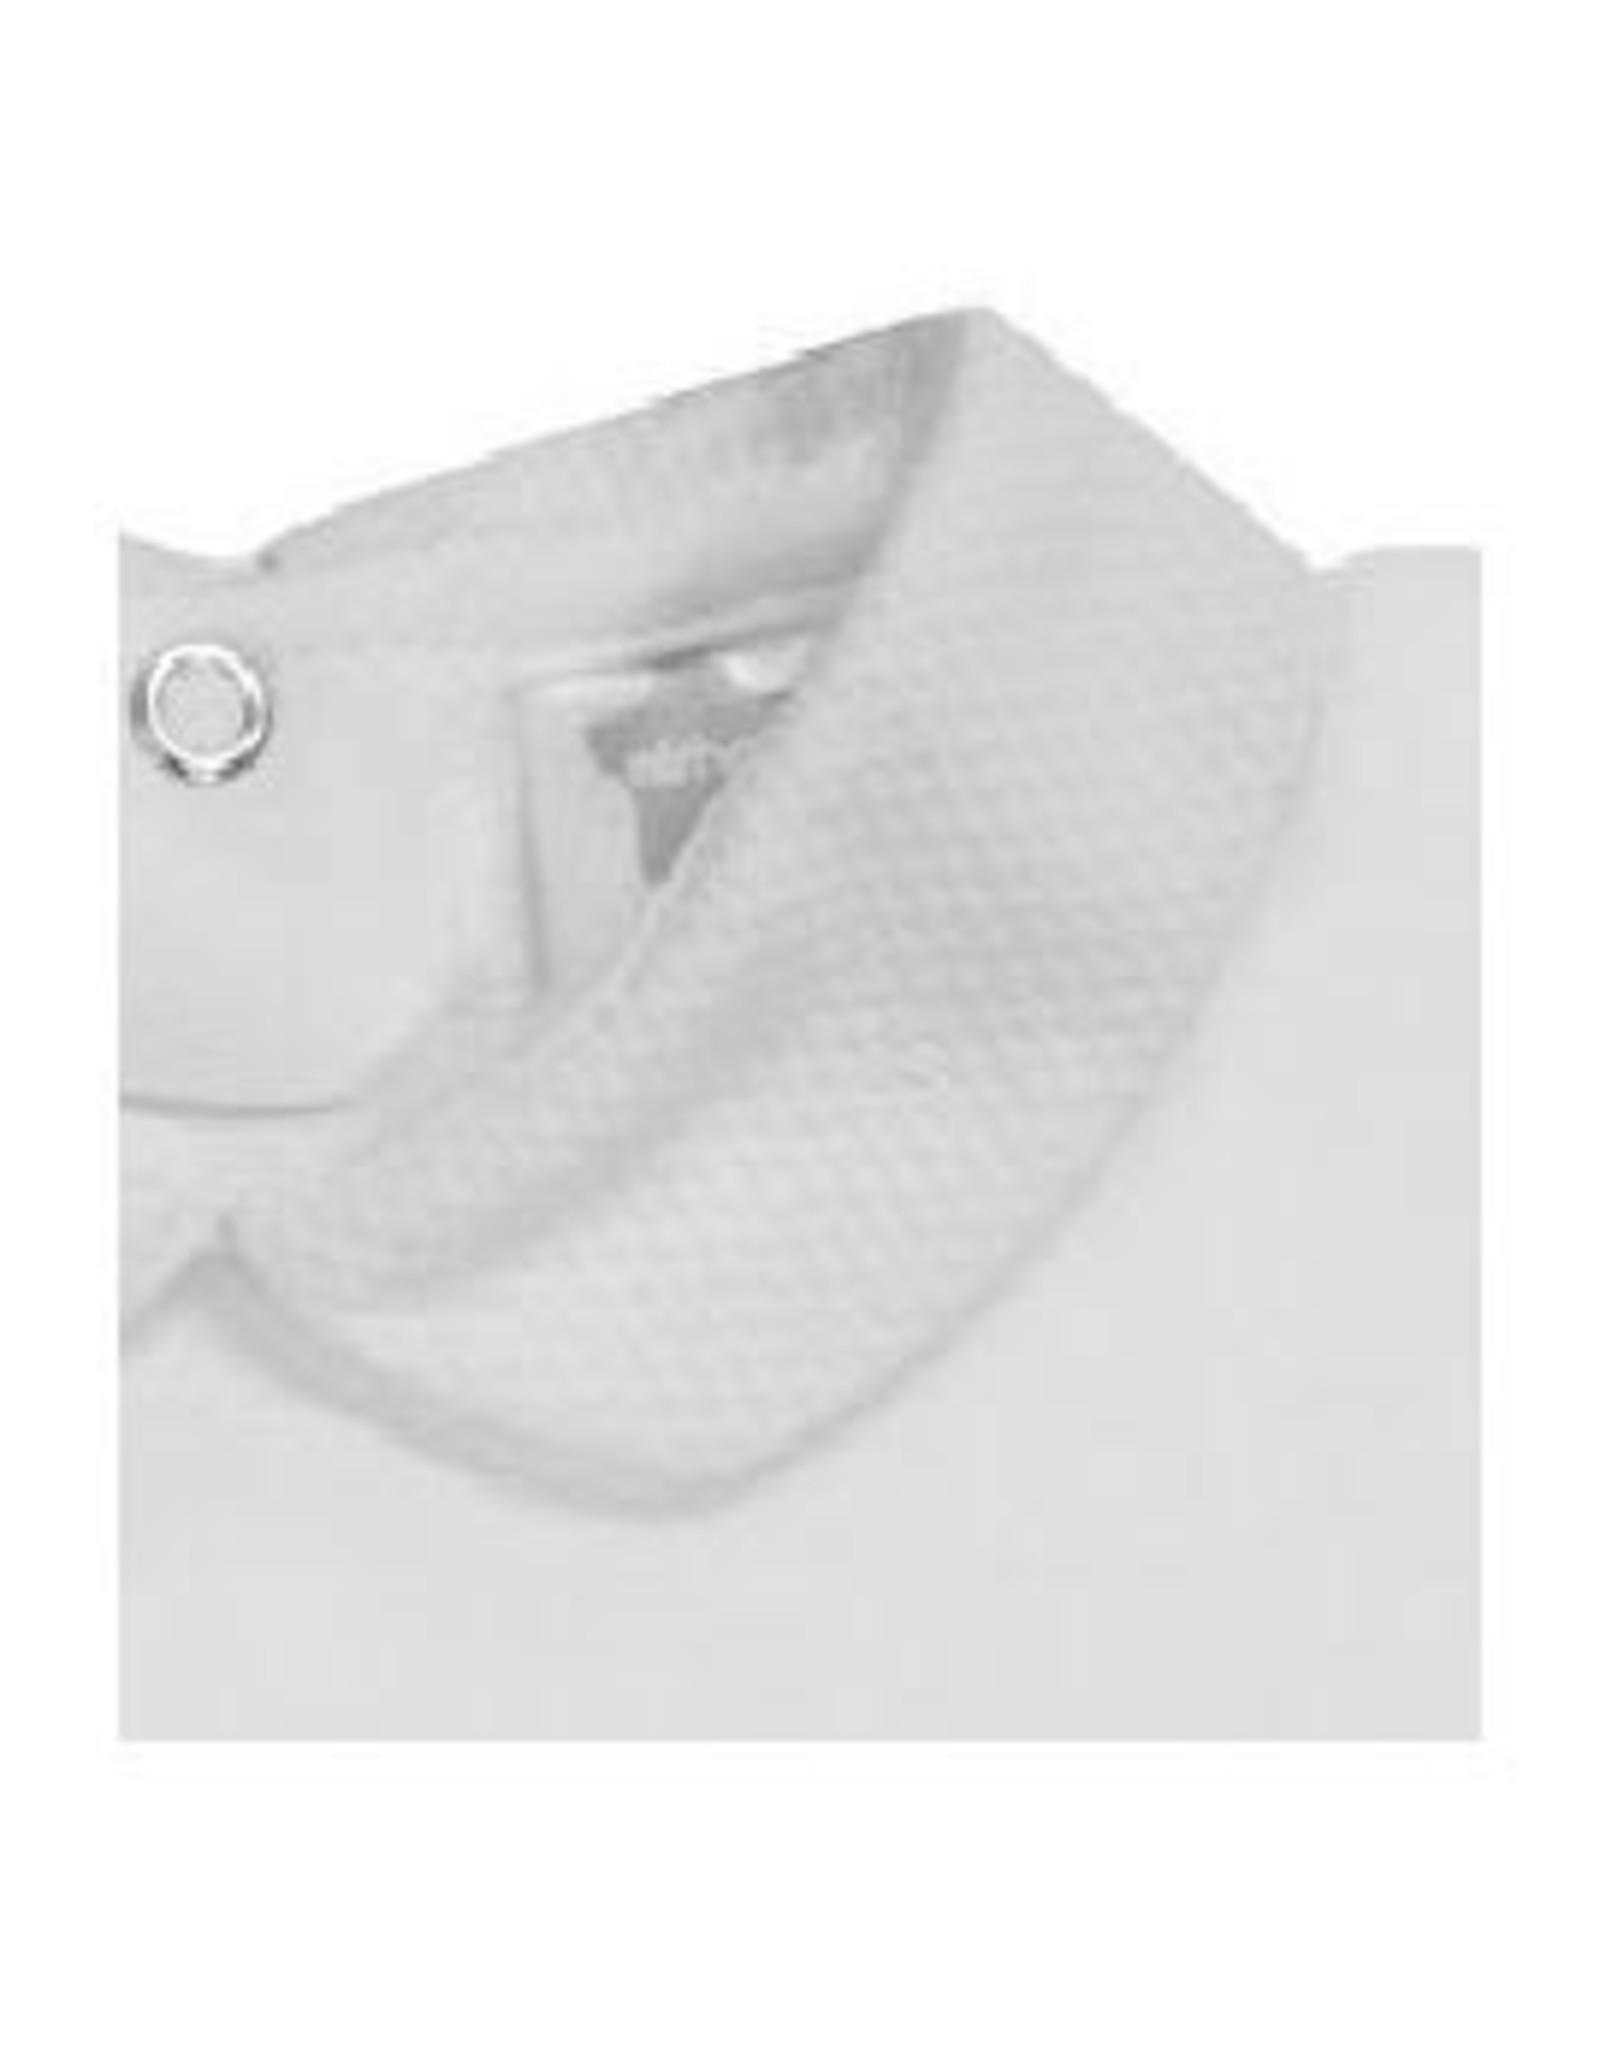 MINHON White Pique Collar Bodyvest